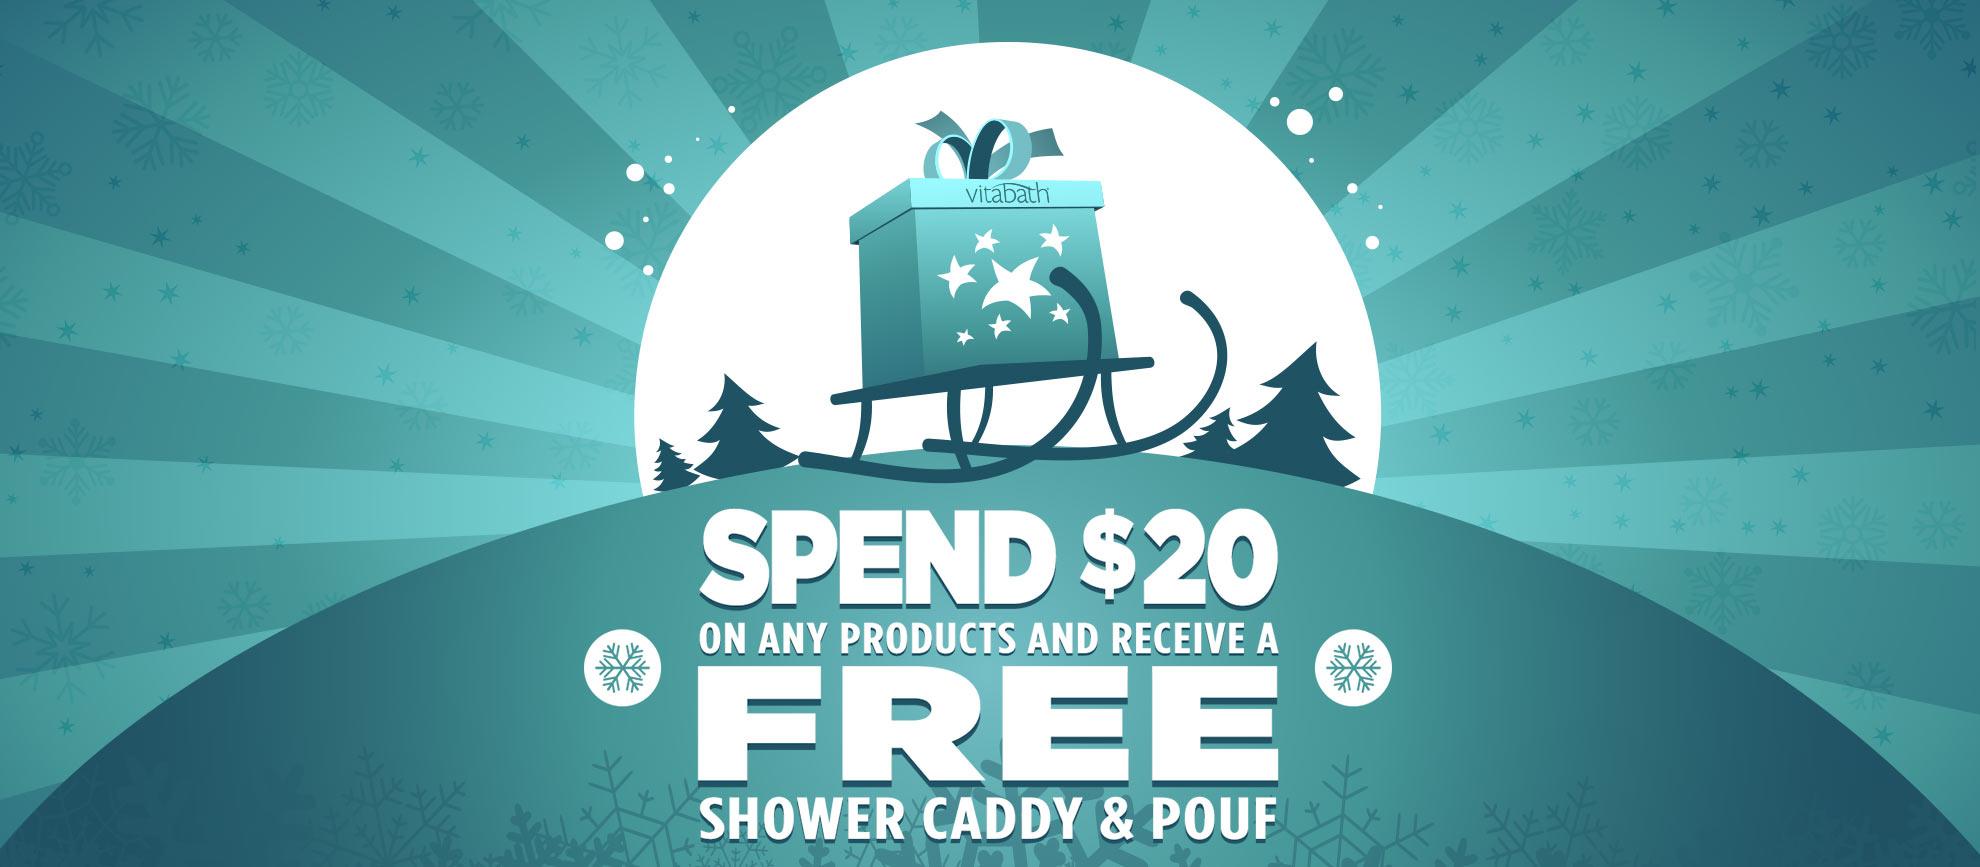 vb-web-slider-free-shower-caddy-promo-12.5.17.jpg